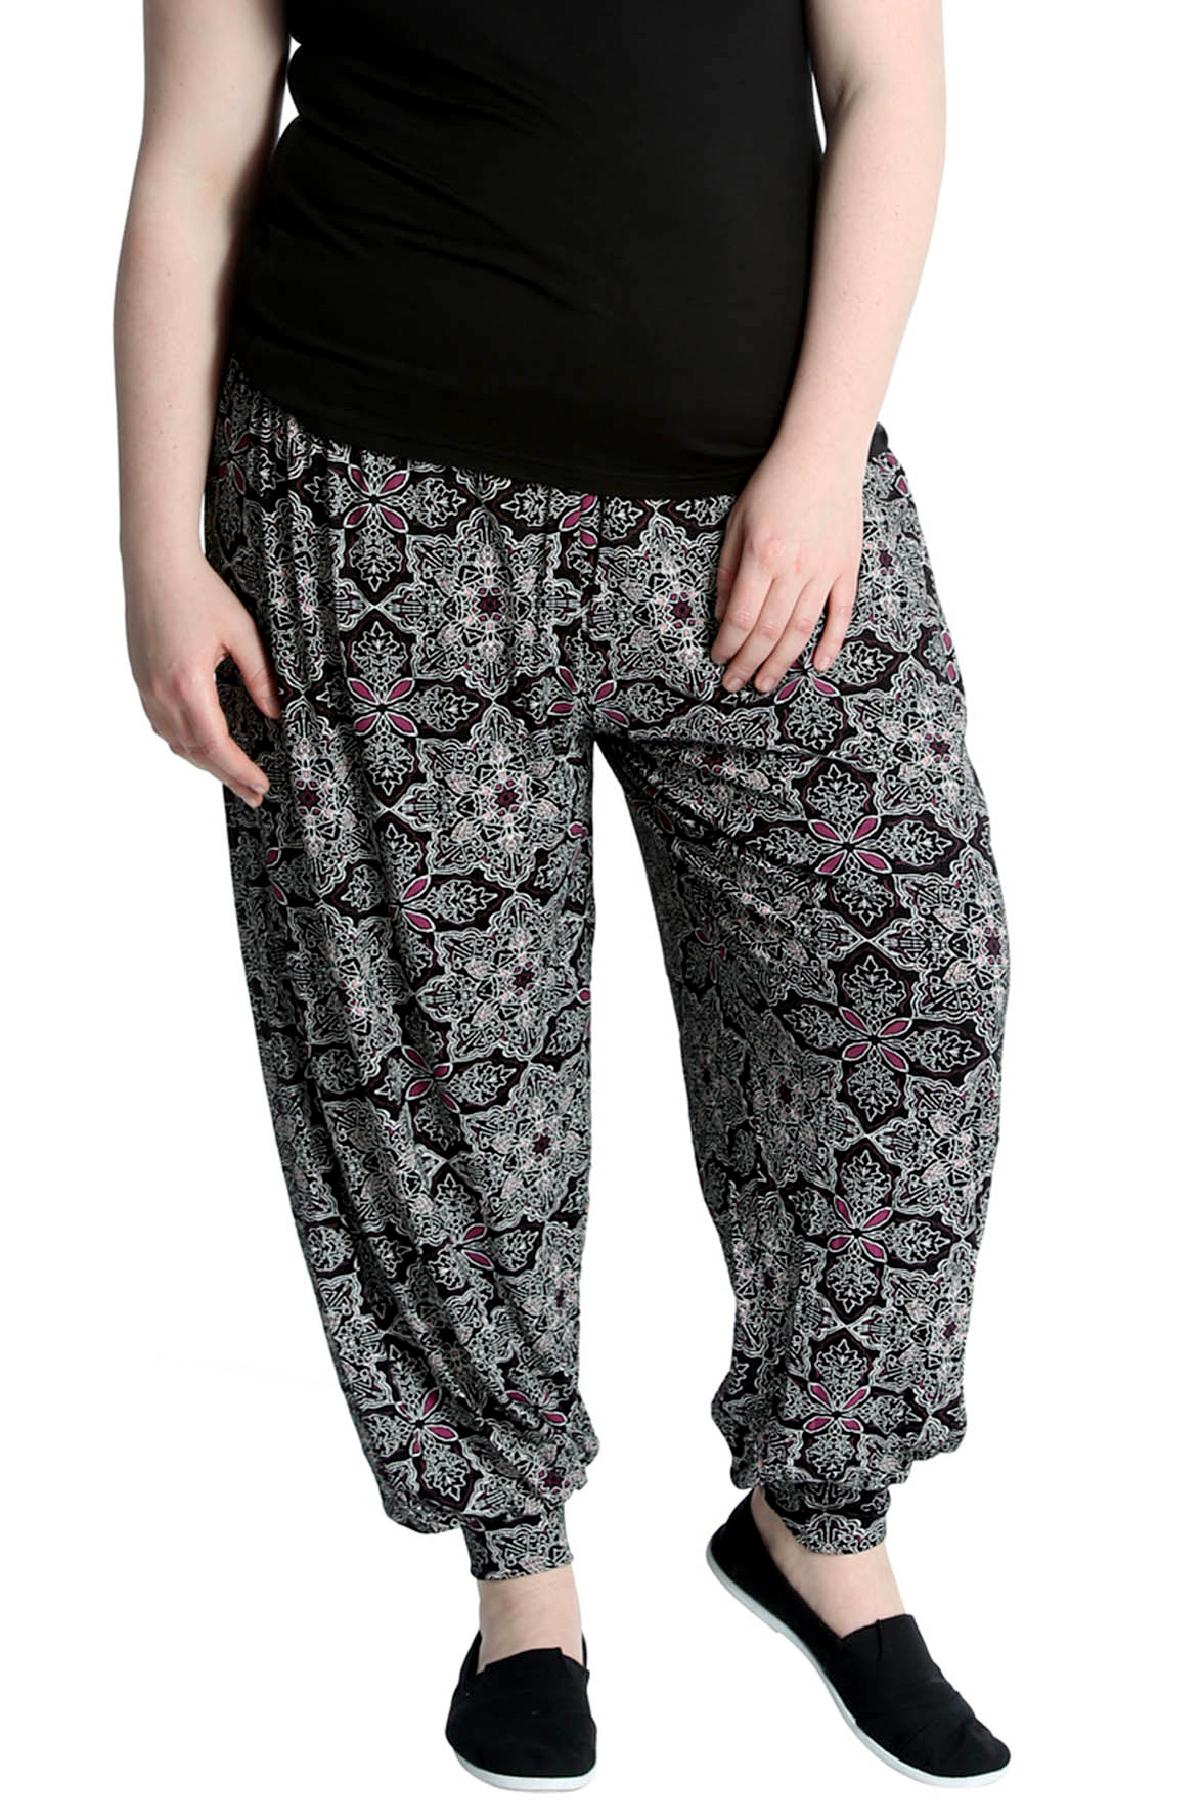 Printed Ladies Harem Girls Pants Cuffed Bottom Ali Baba Womens Trousers